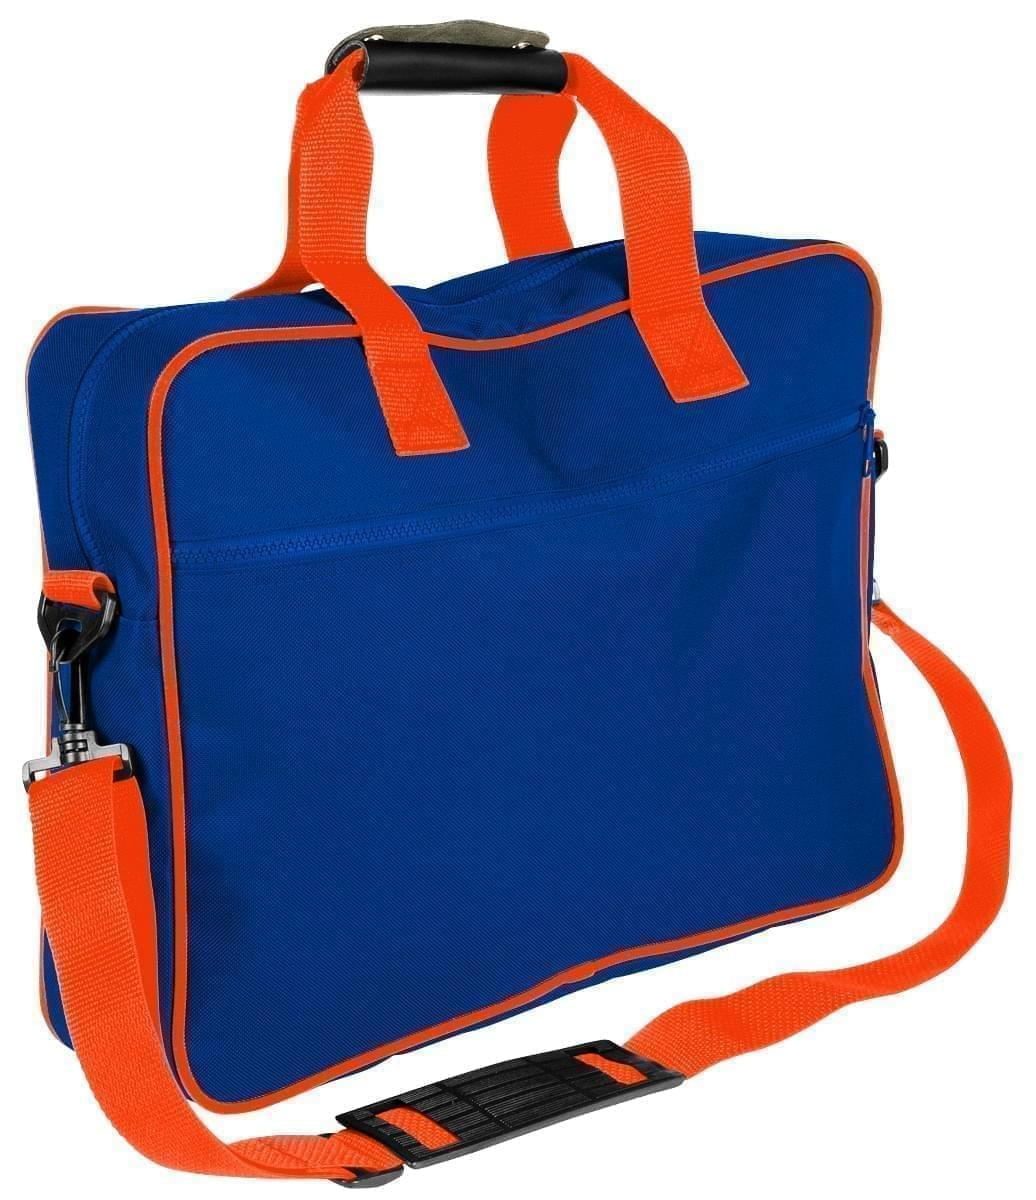 USA Made Nylon Poly Notebook Sleeves, Royal Blue-Orange, CPKVA59P00